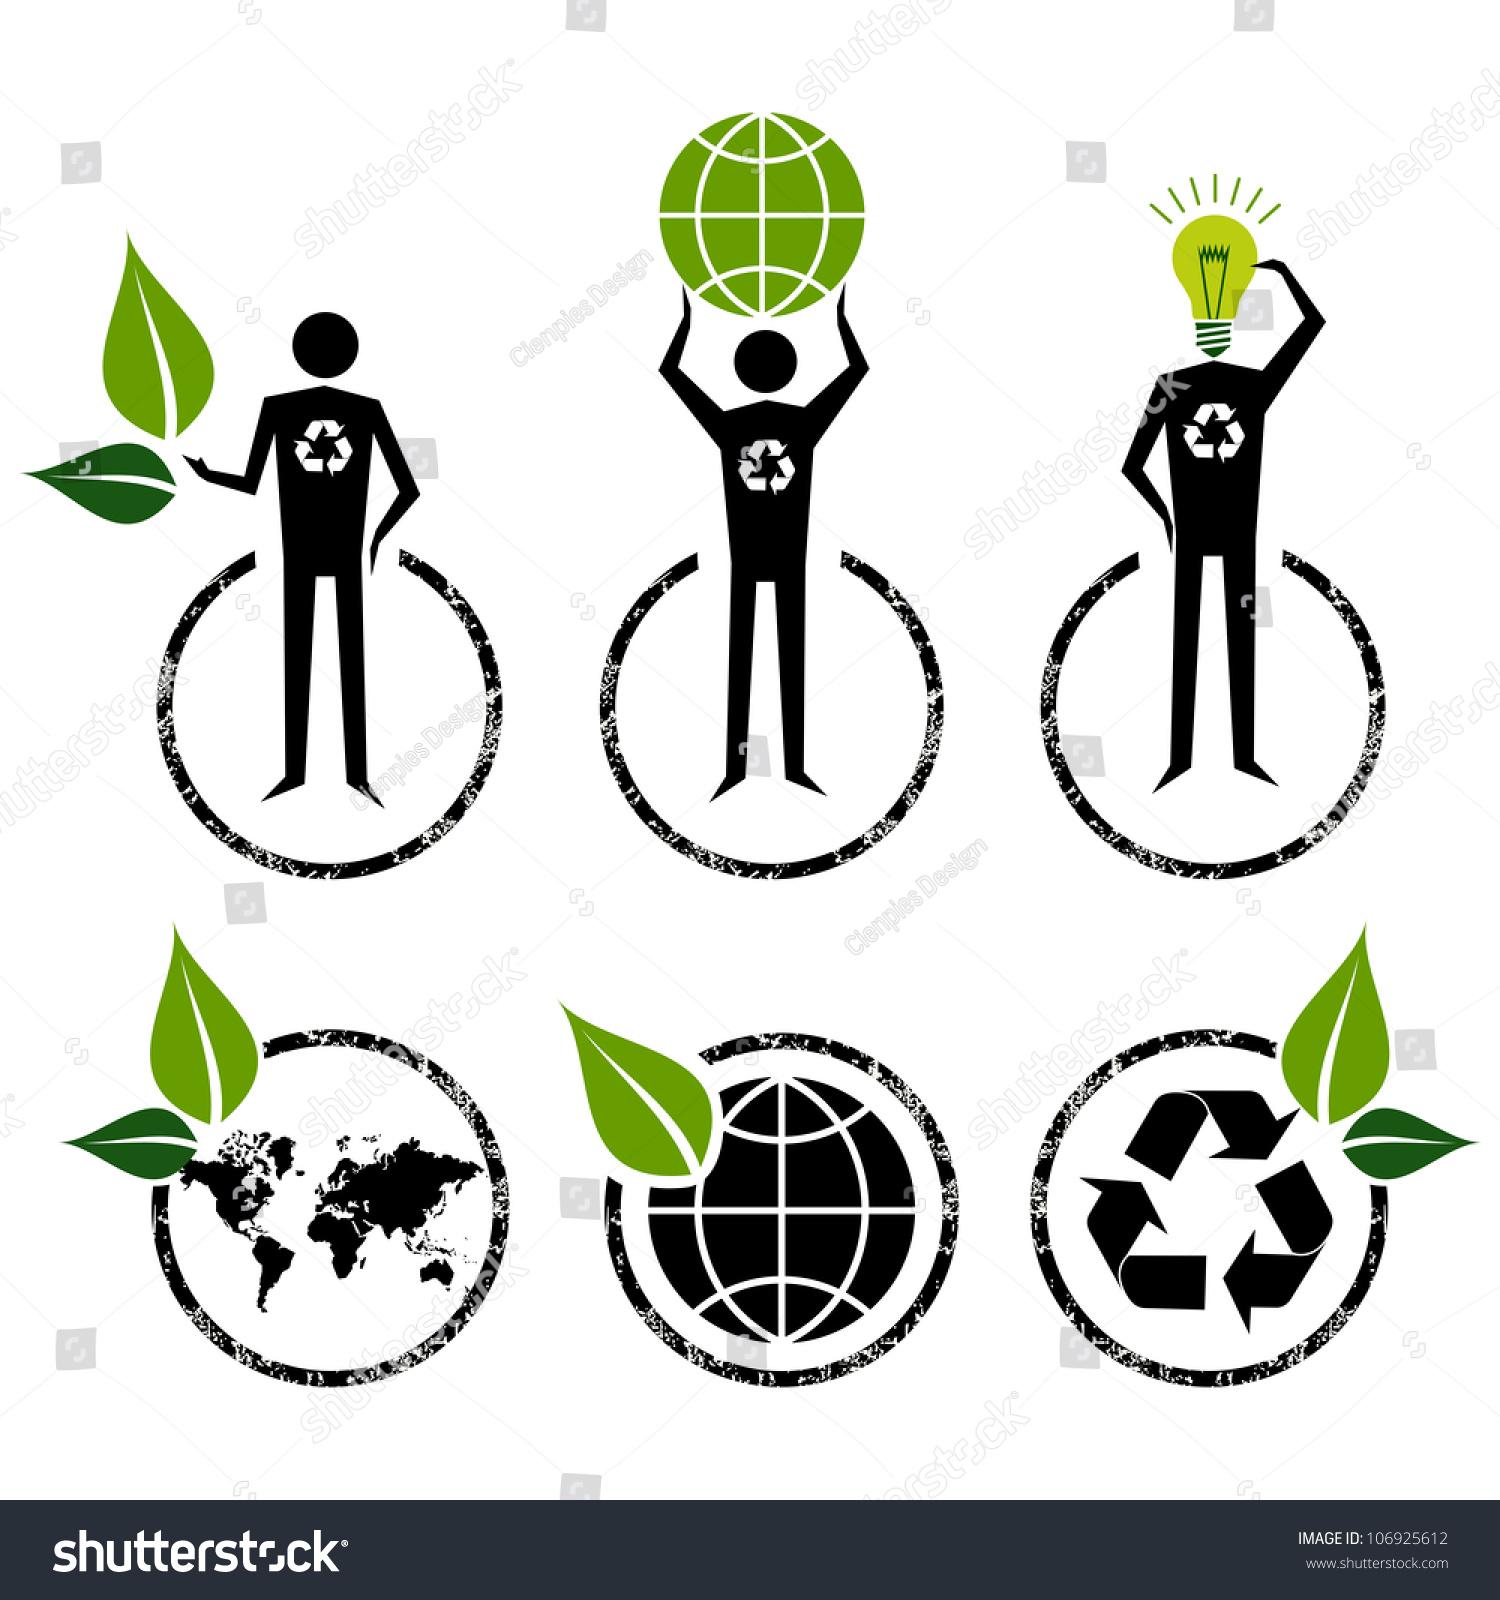 Superb Go Green Ideas Part - 7: Superb Go Green Ideas Gallery